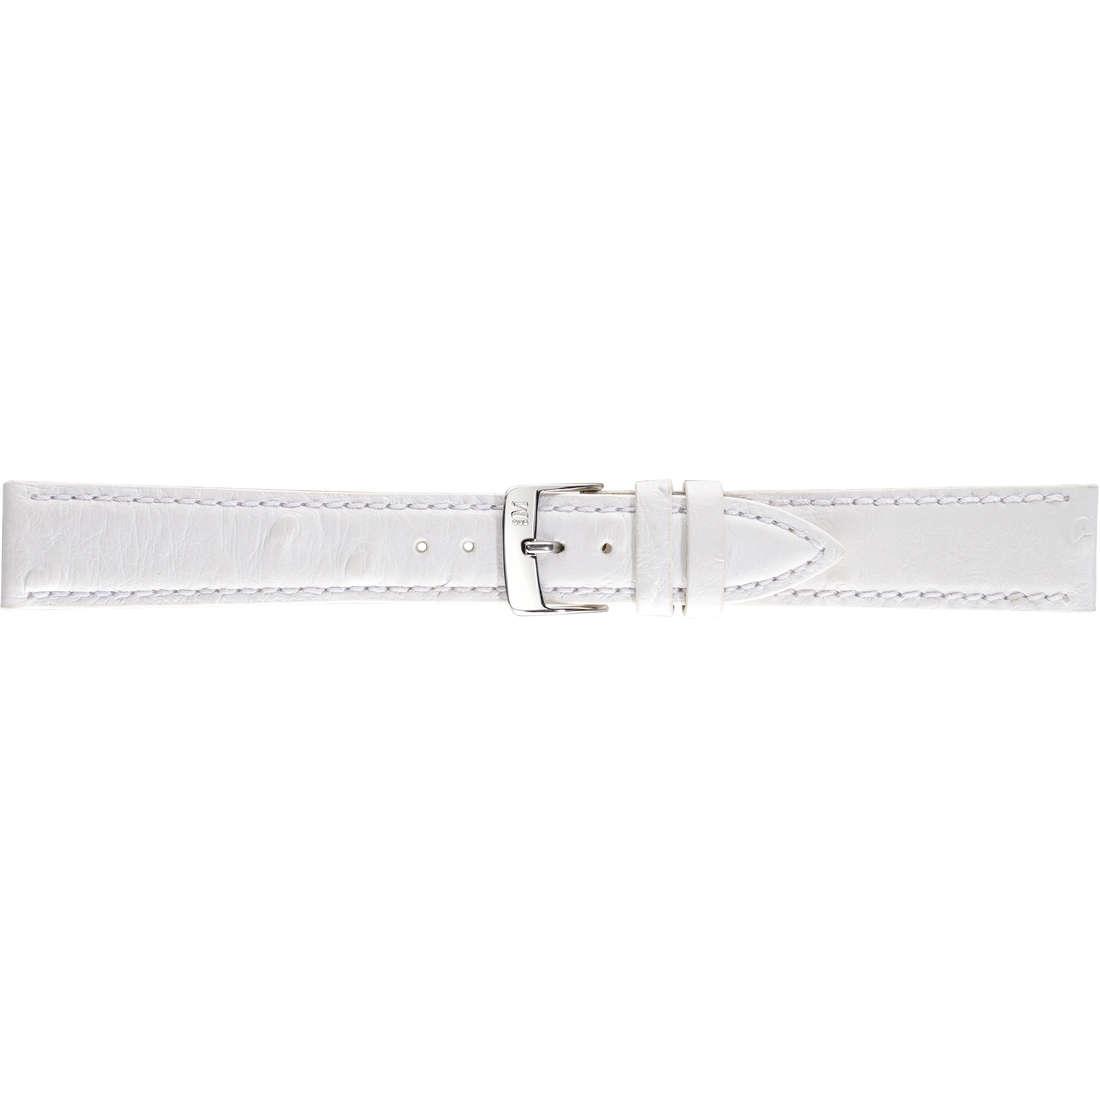 watch watch bands watch straps man Morellato Morellato 1930 A01X4560498017CR20